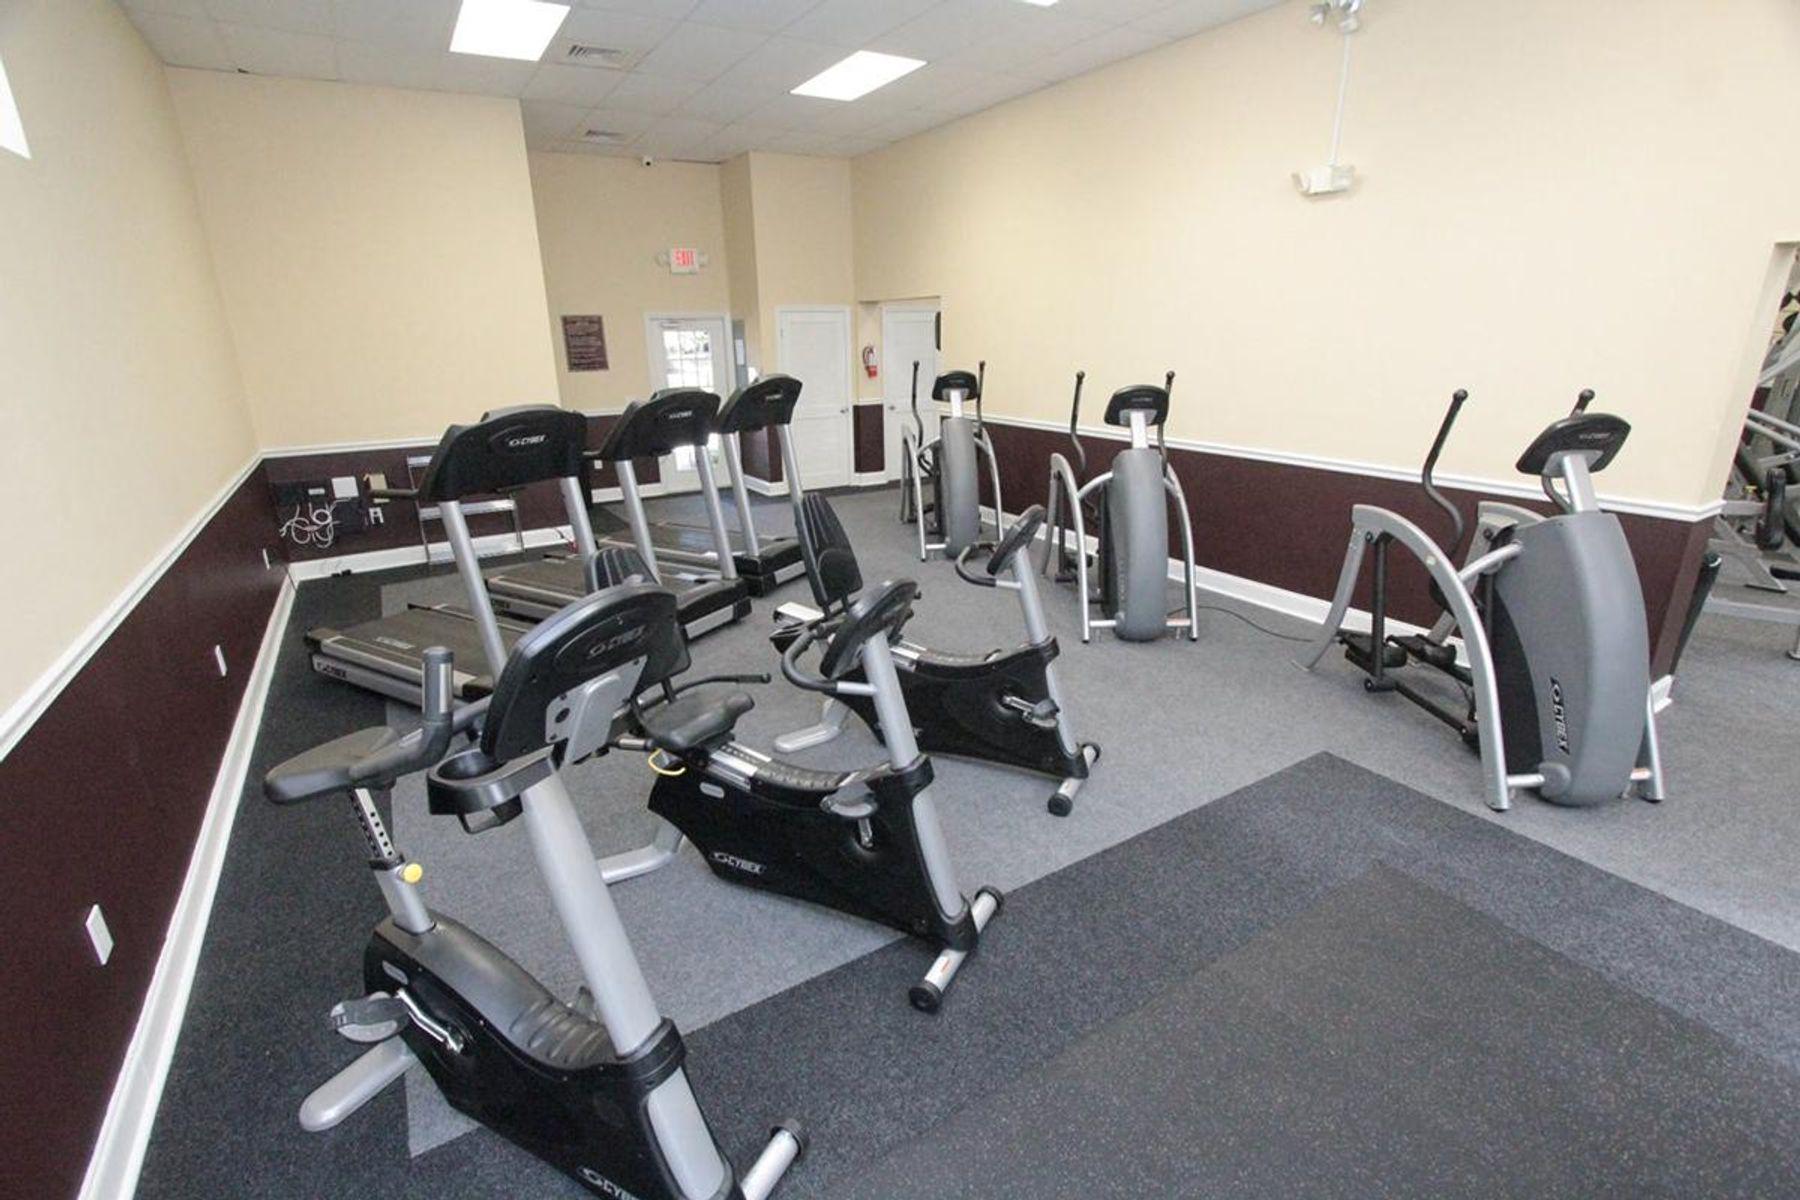 Copy of fitness center 2.jpg